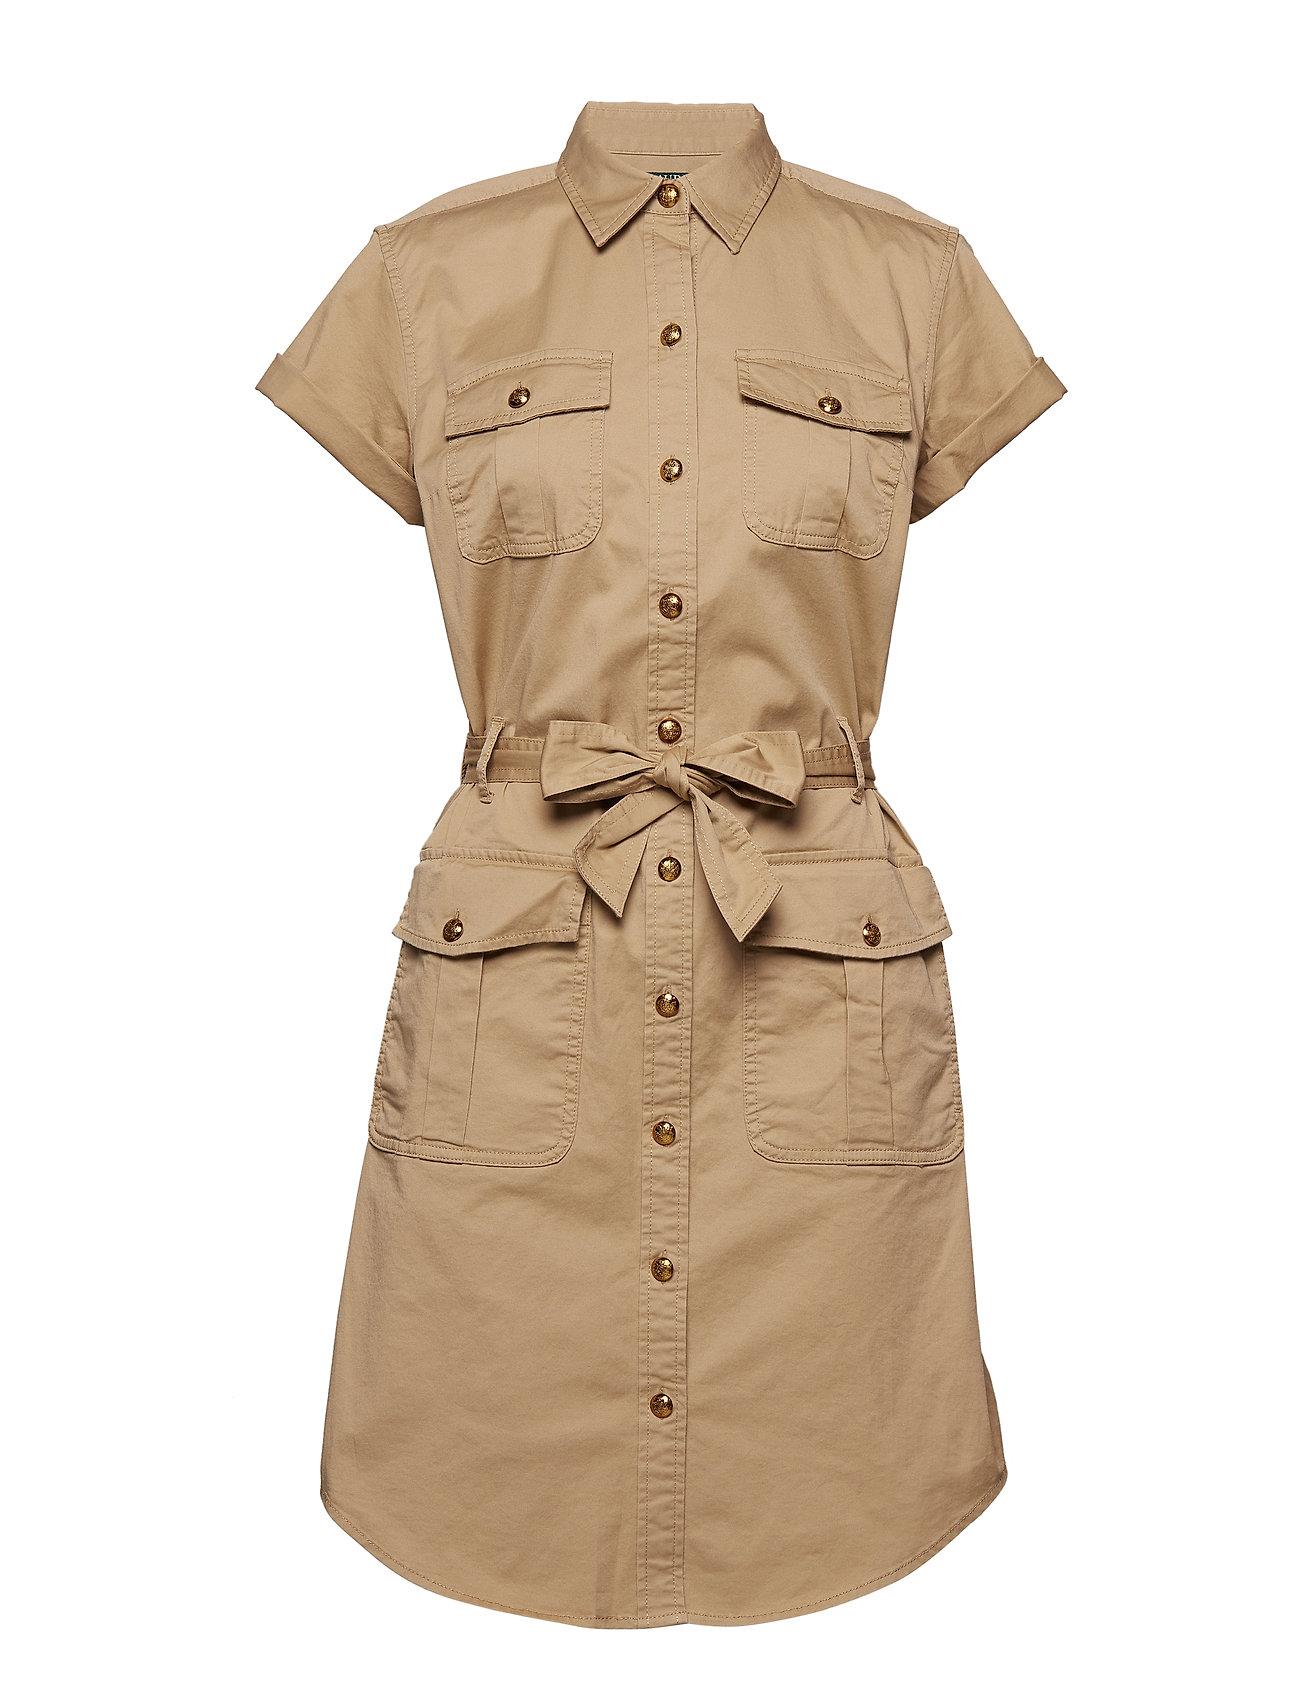 23172f7bf91 Twill Shirtdress (Spring Khaki) (£155) - Lauren Ralph Lauren ...